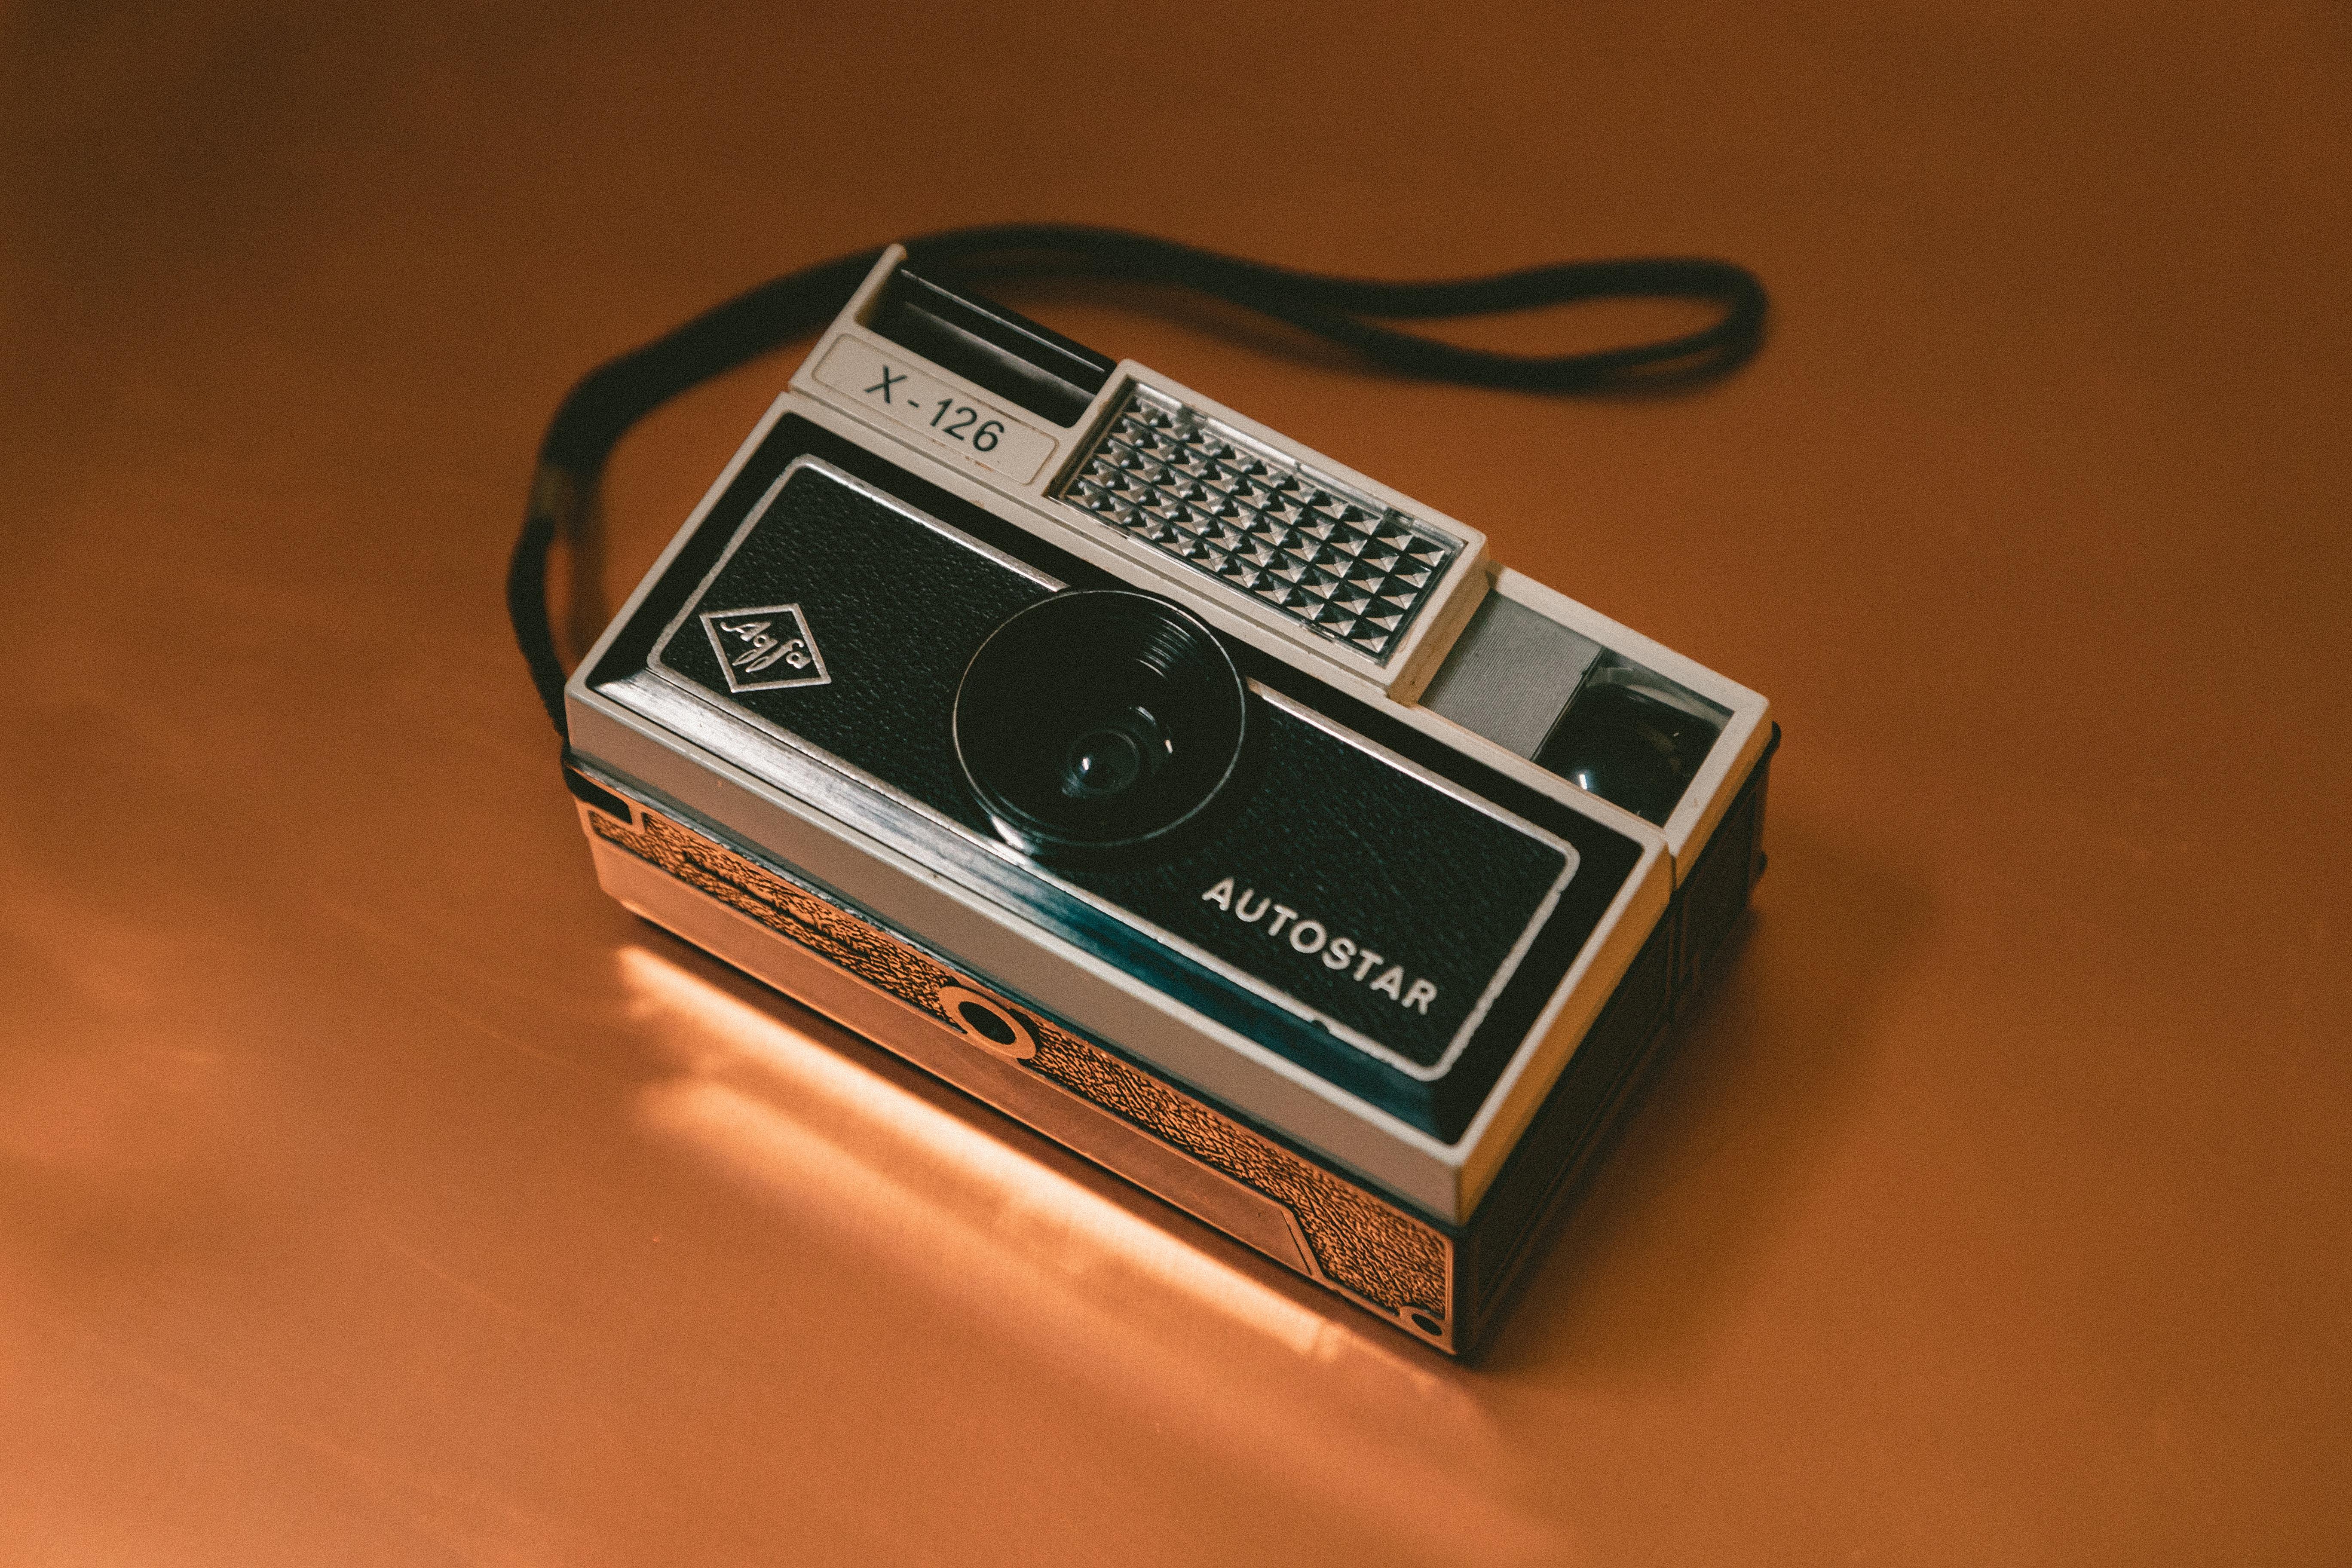 photo of gray and black X-216 camera